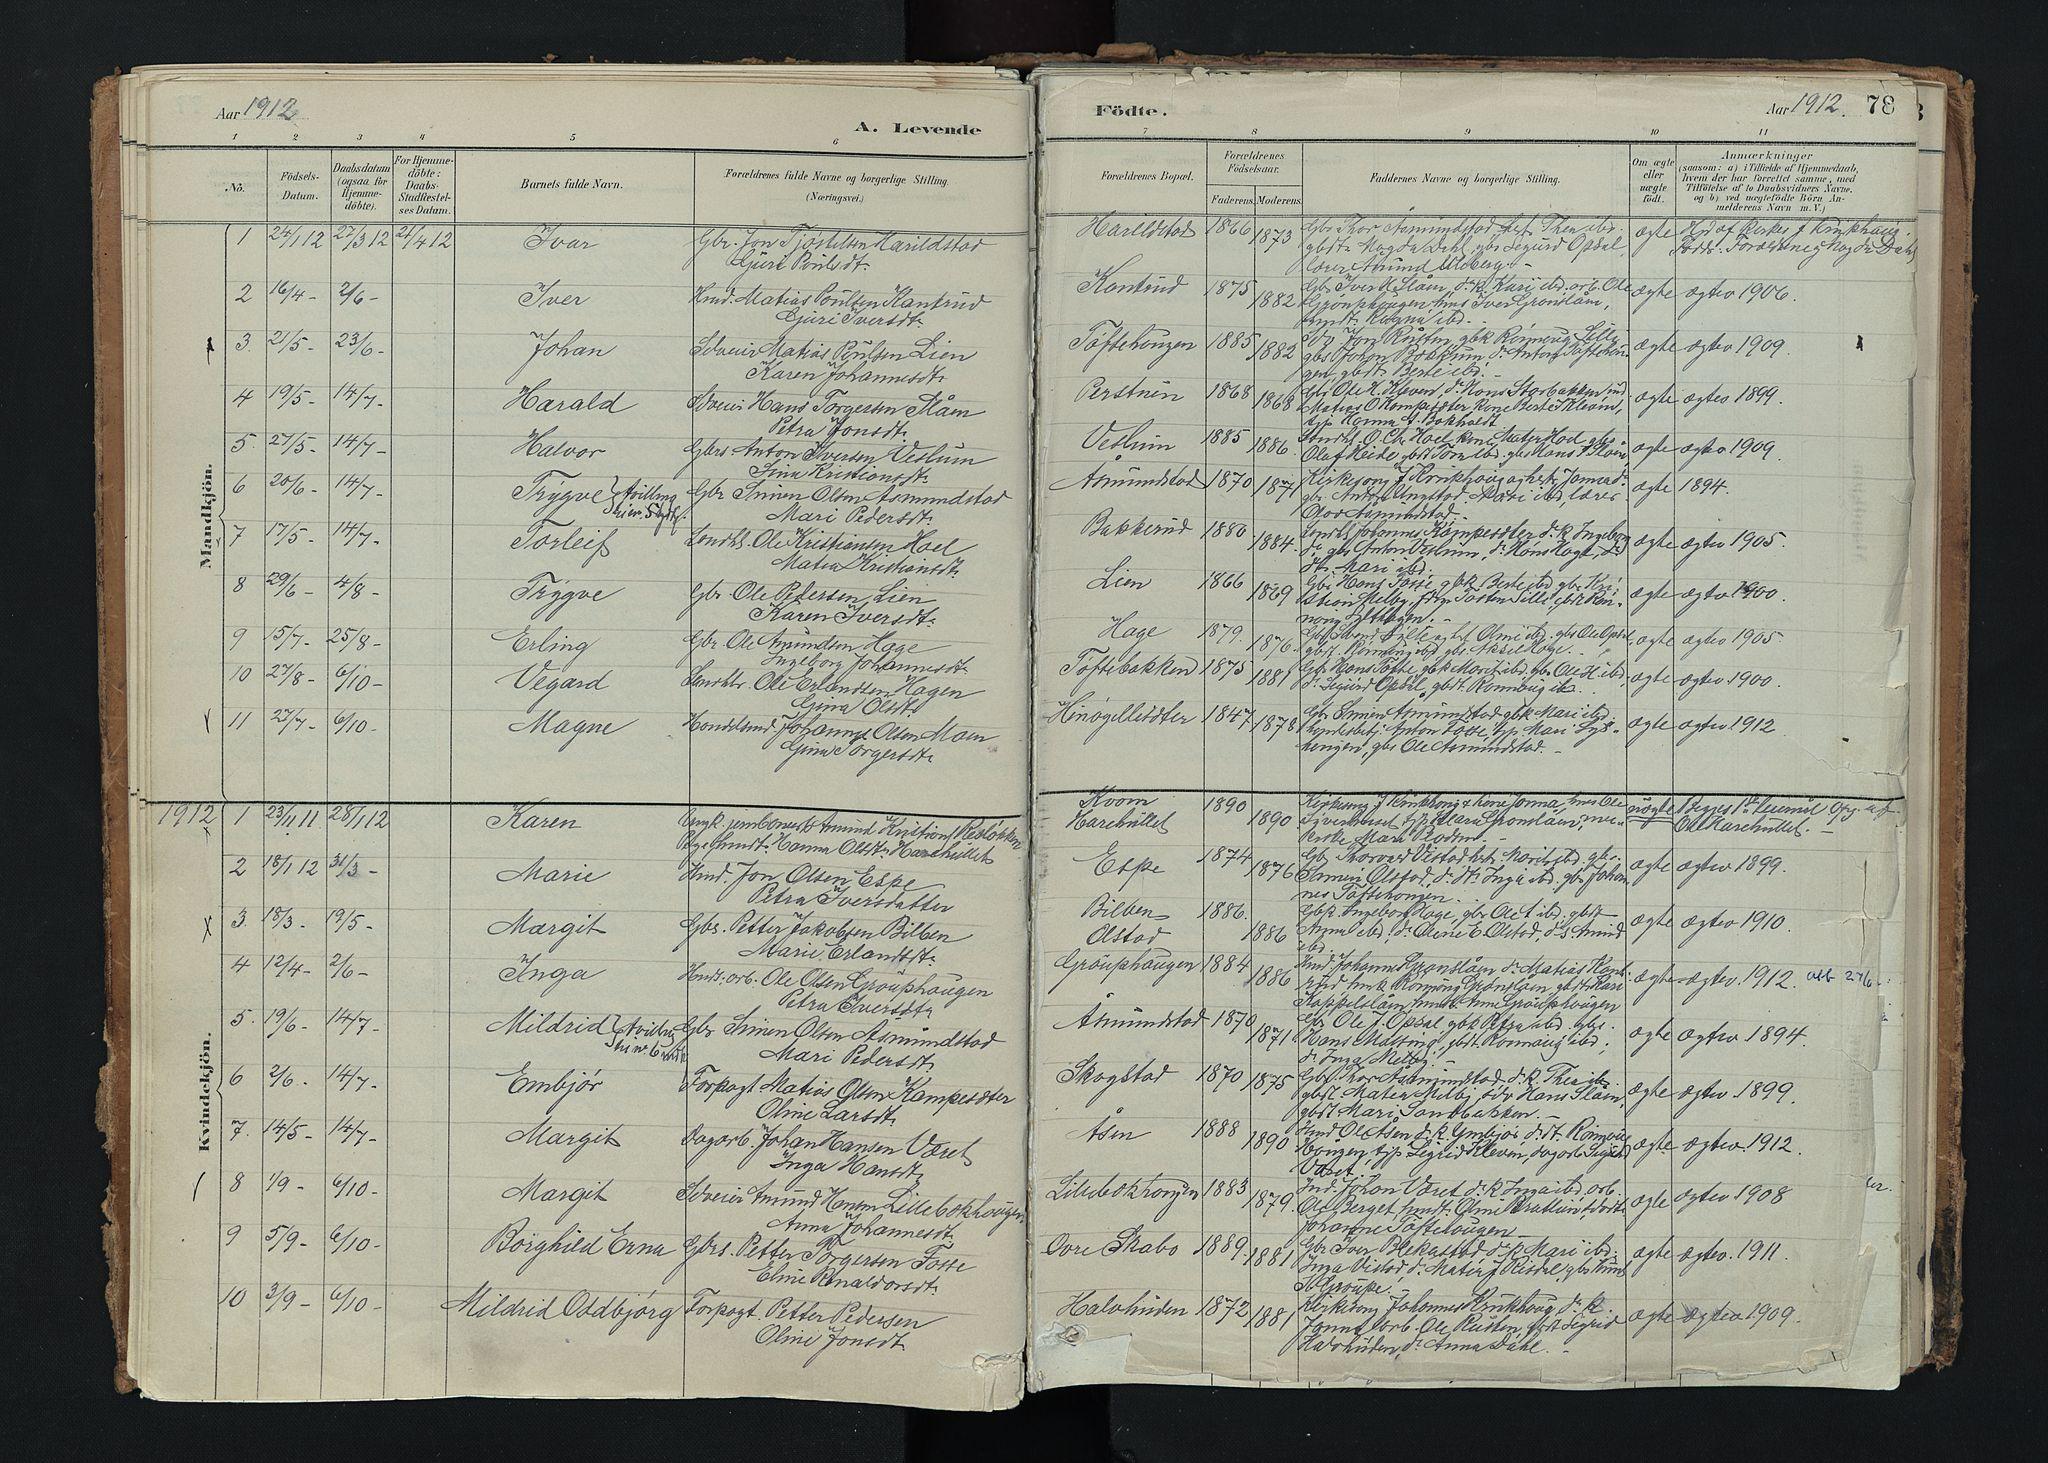 SAH, Nord-Fron prestekontor, Ministerialbok nr. 5, 1884-1914, s. 78